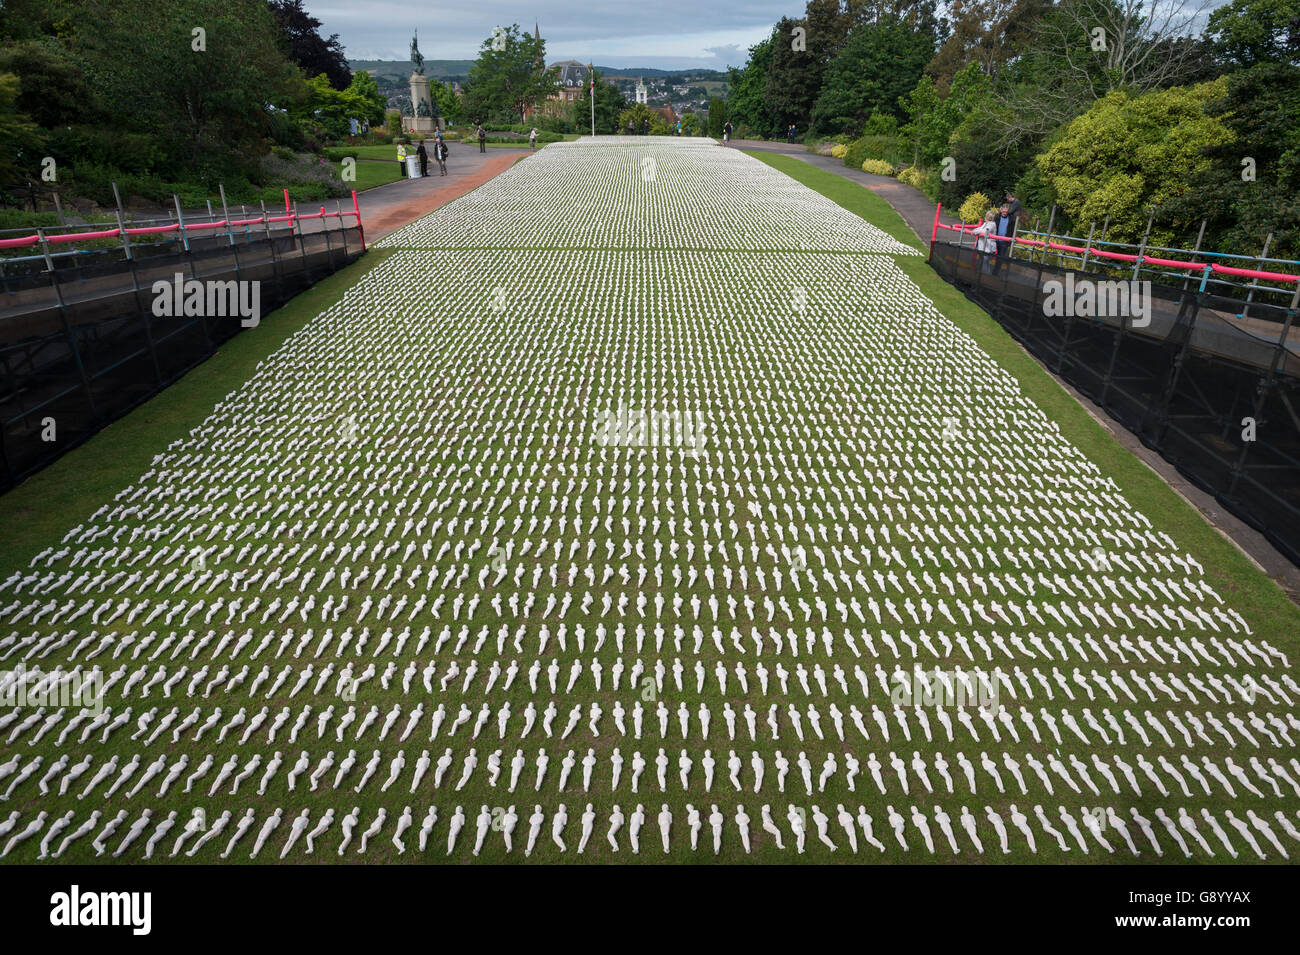 Exeter, UK. 1. Juli 2016. Die Schlacht an der Somme erinnert in Northernhay Gärten, Exeter, UK, 19.240 verhüllte Stockfoto